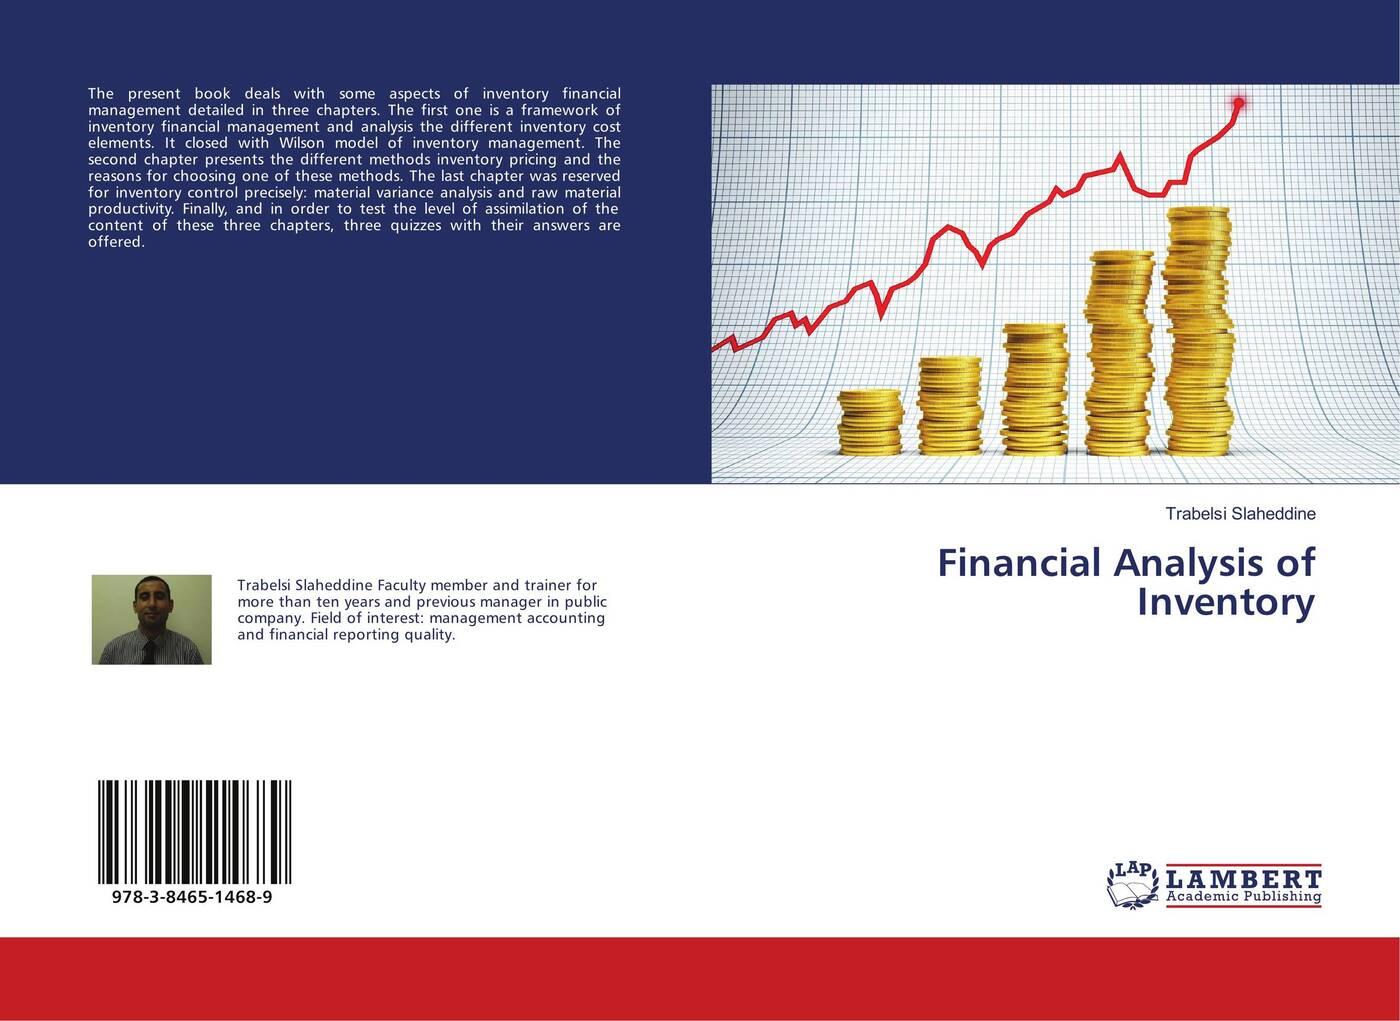 цены Trabelsi Slaheddine Financial Analysis of Inventory